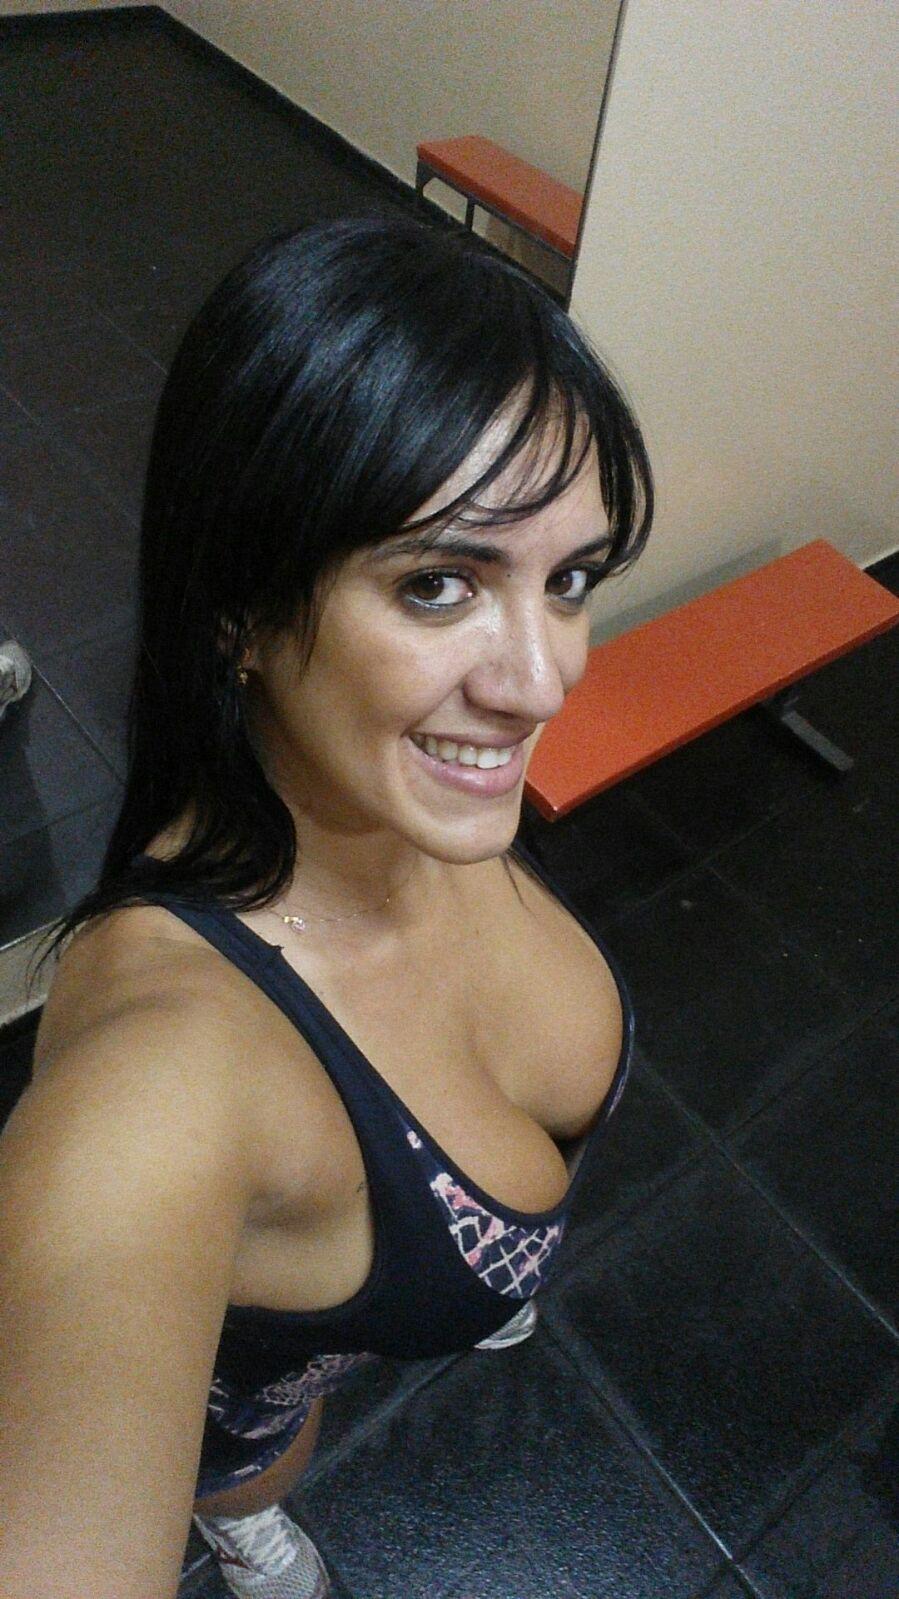 A volta de Marisa, a turbinada tesuda caiu na net (fotos e vídeos) download